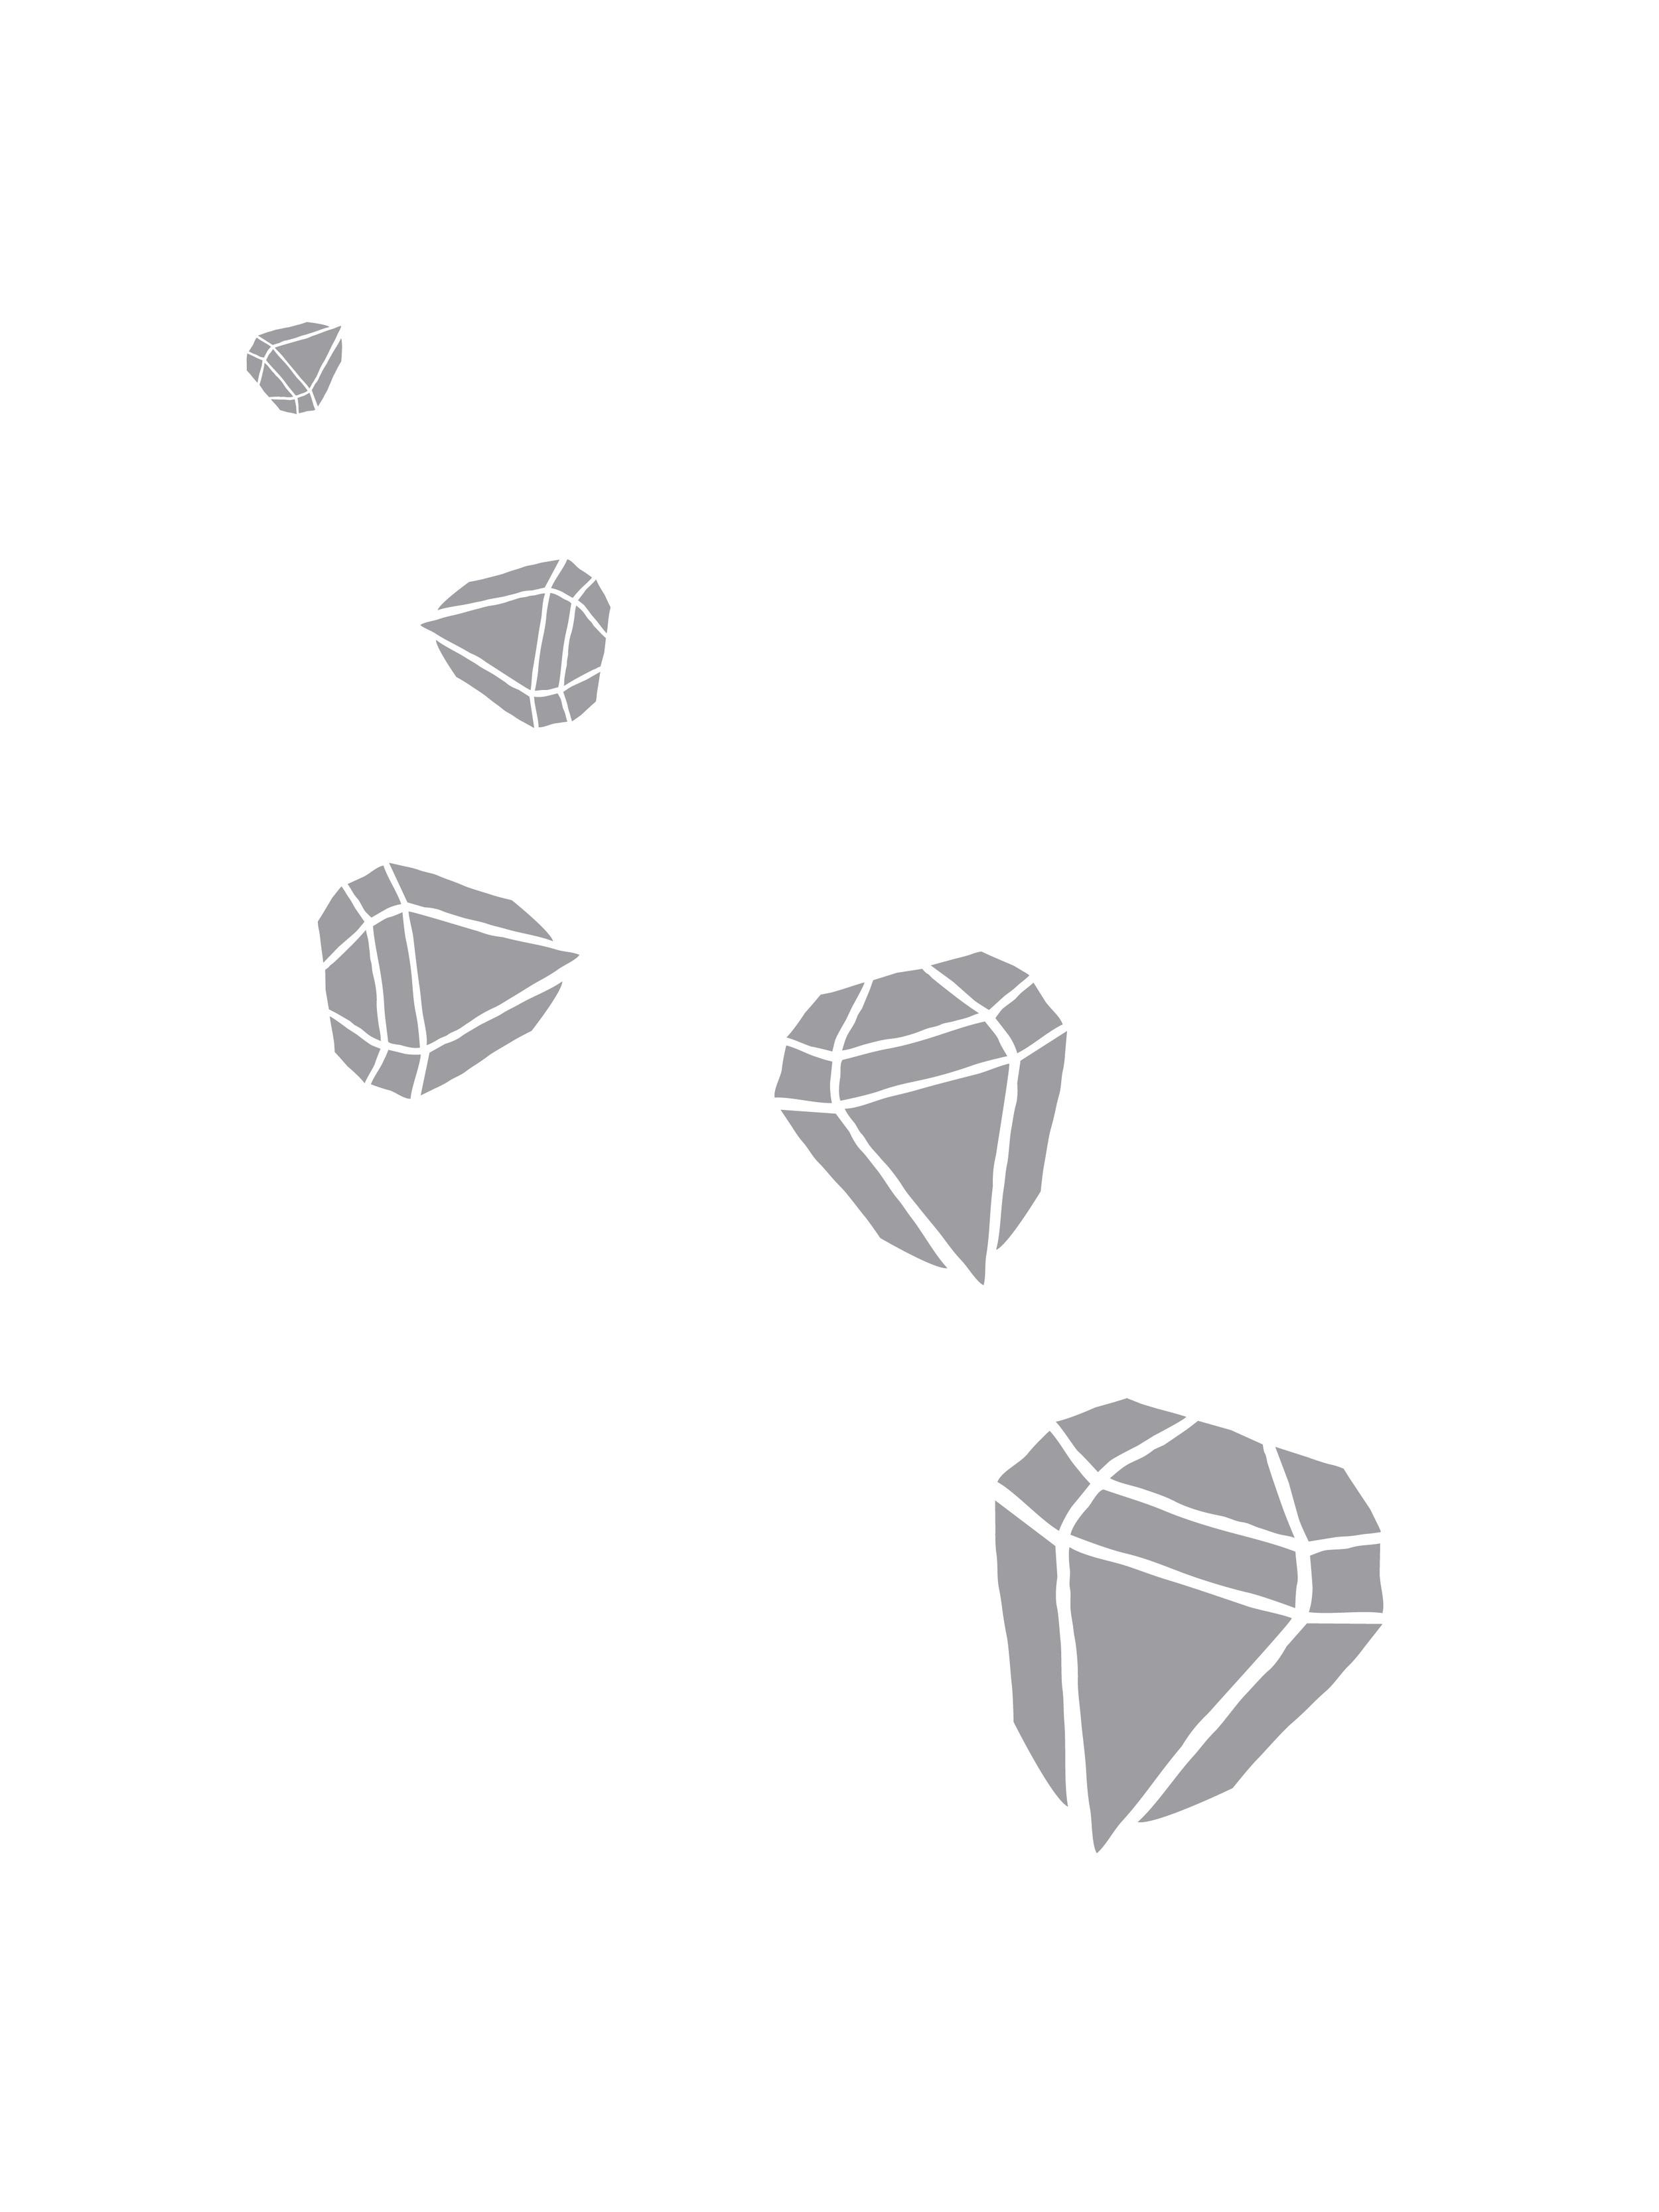 DMD_Tablet_Falling Gems_Grey on White-01.jpg